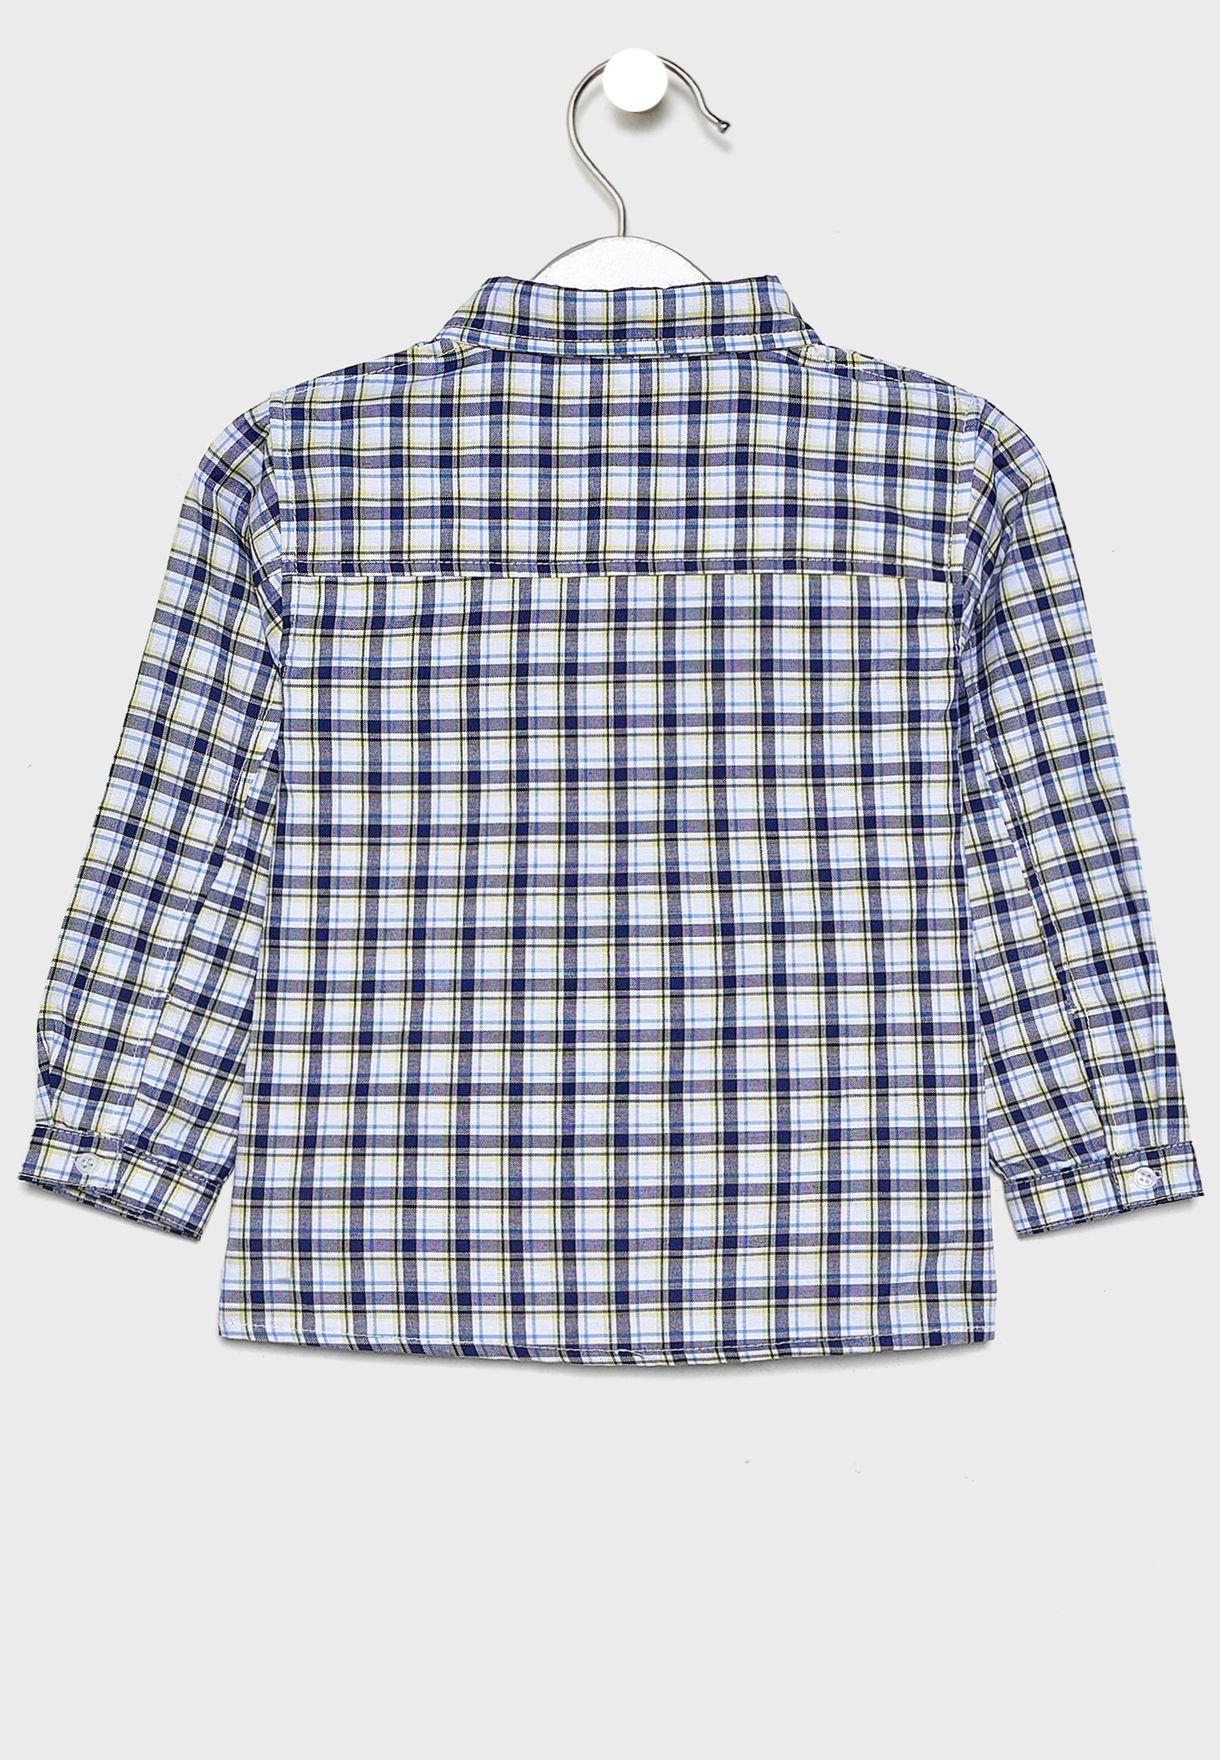 Little Check Shirt + Jeans Set